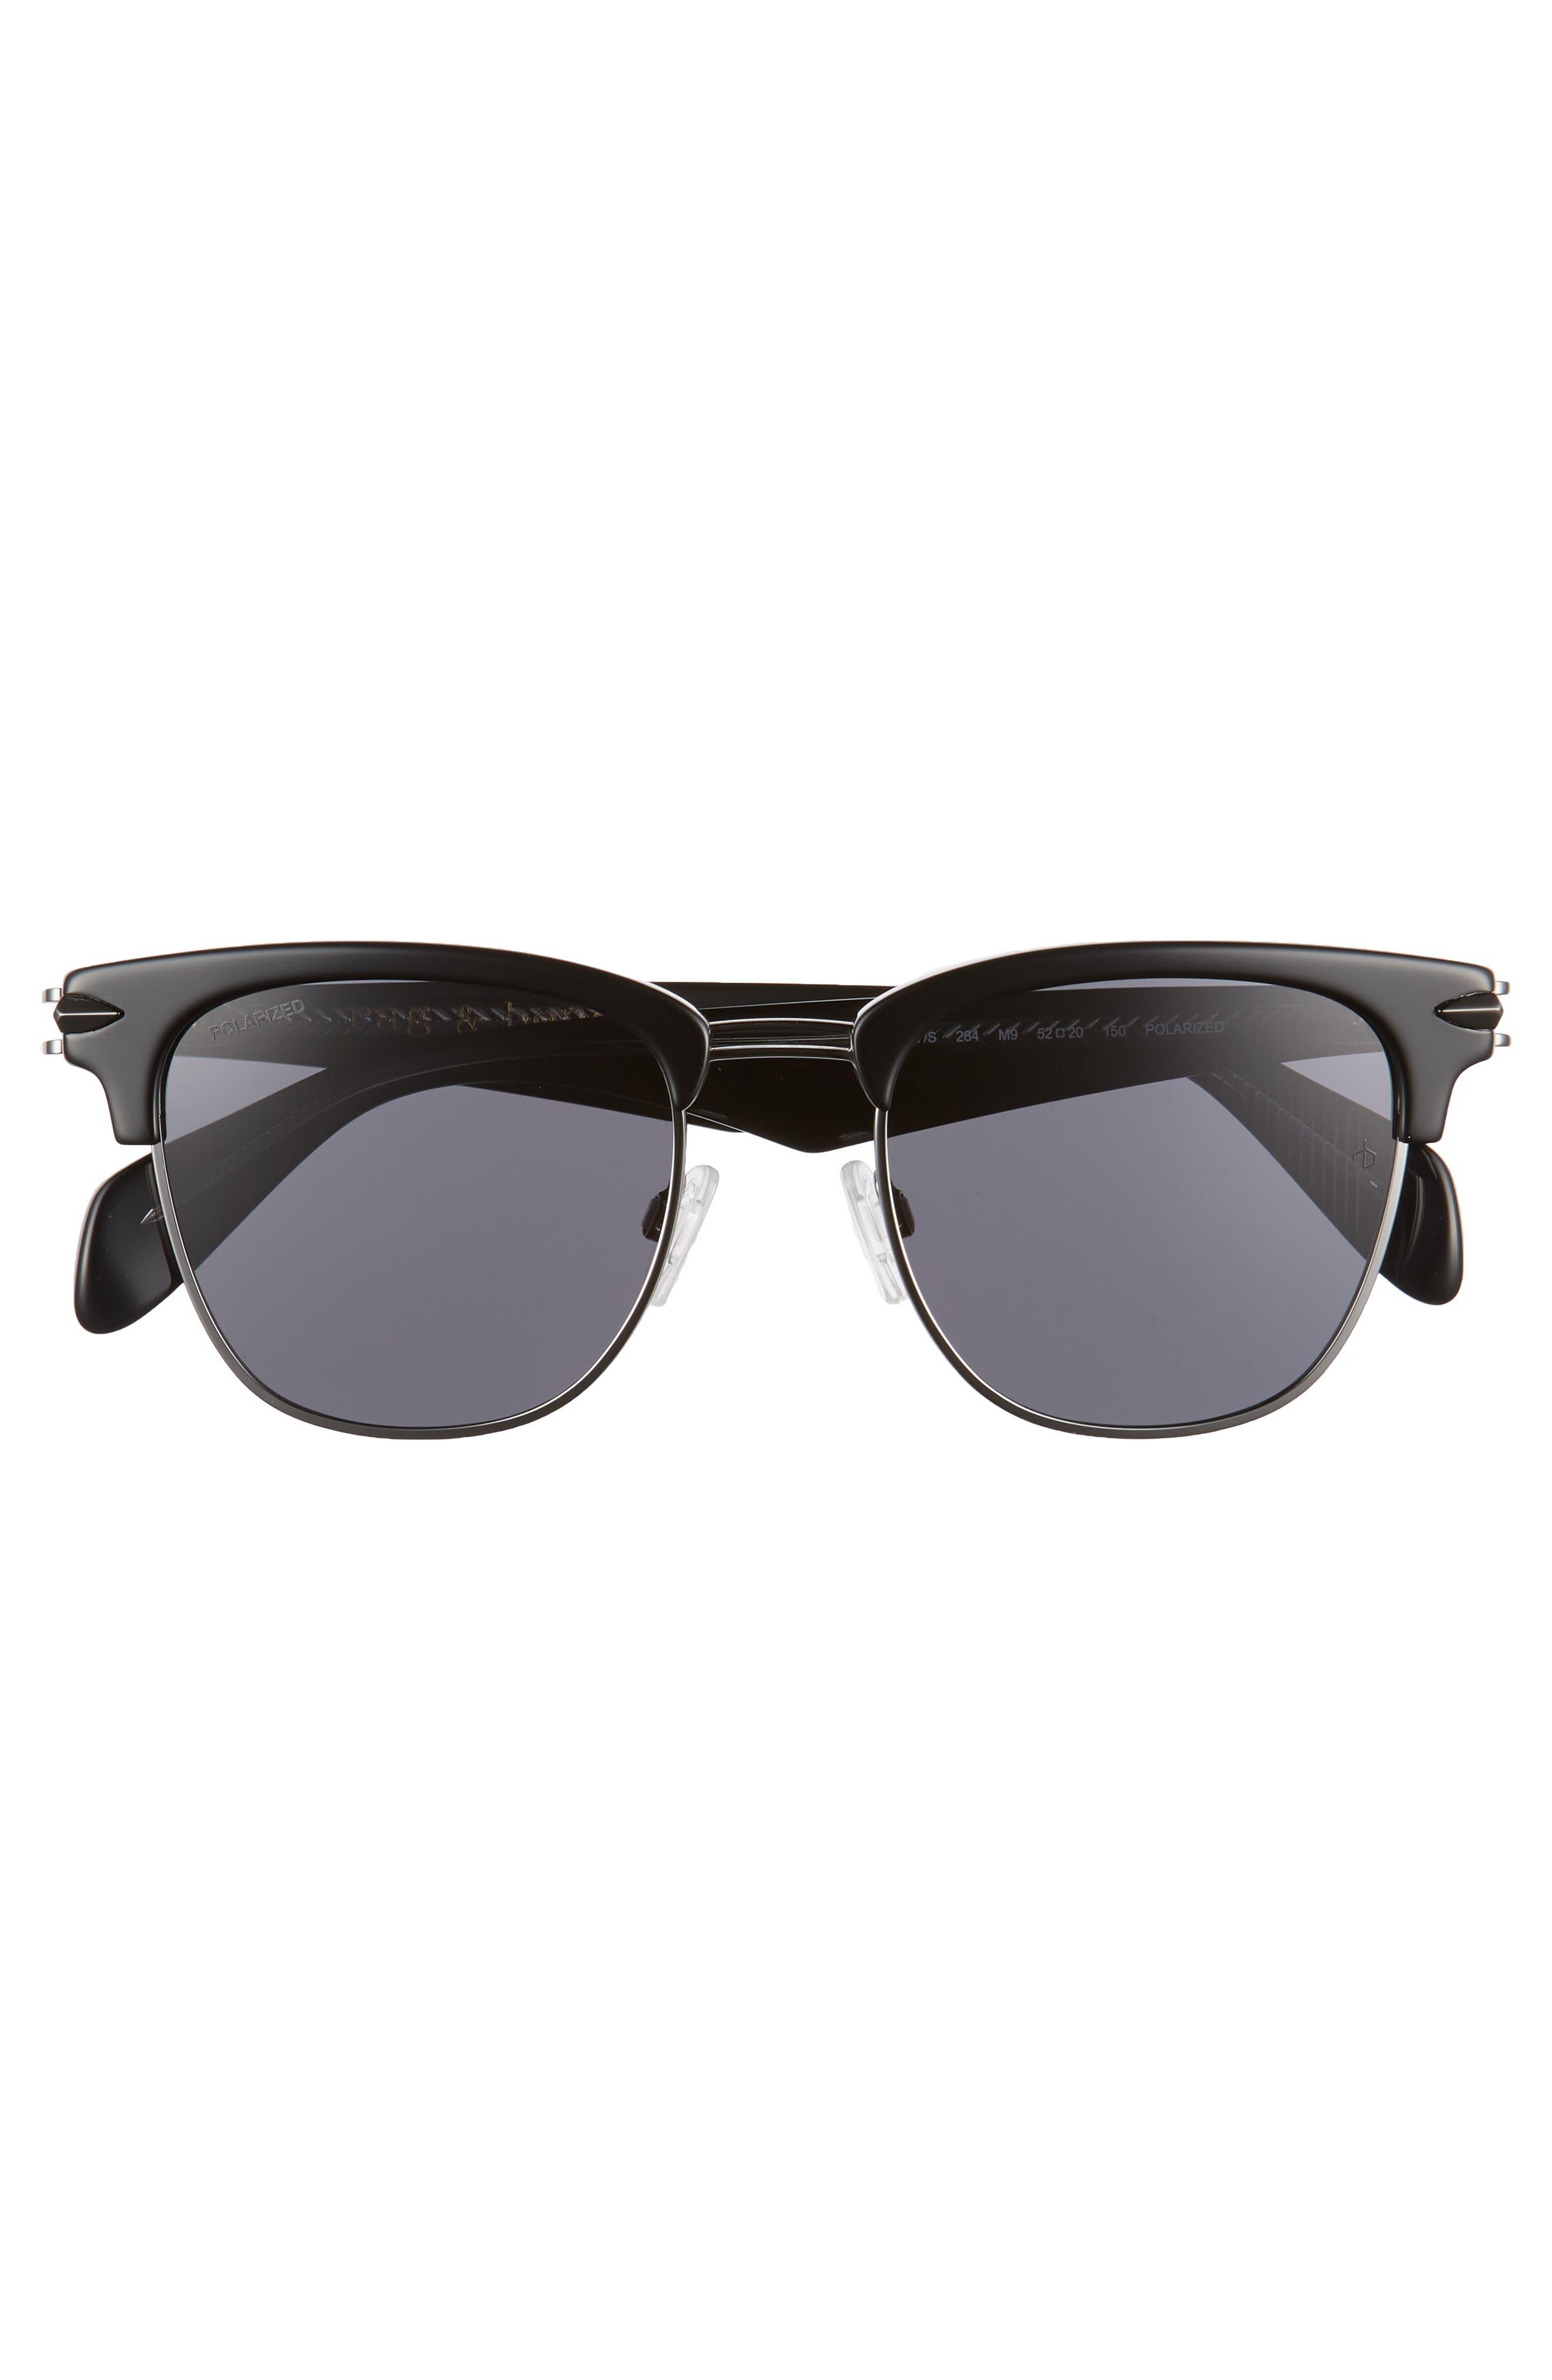 RAG & BONE,                             52mm Polarized Sunglasses,                             Alternate thumbnail 2, color,                             BLACK RUTH/ POLAR